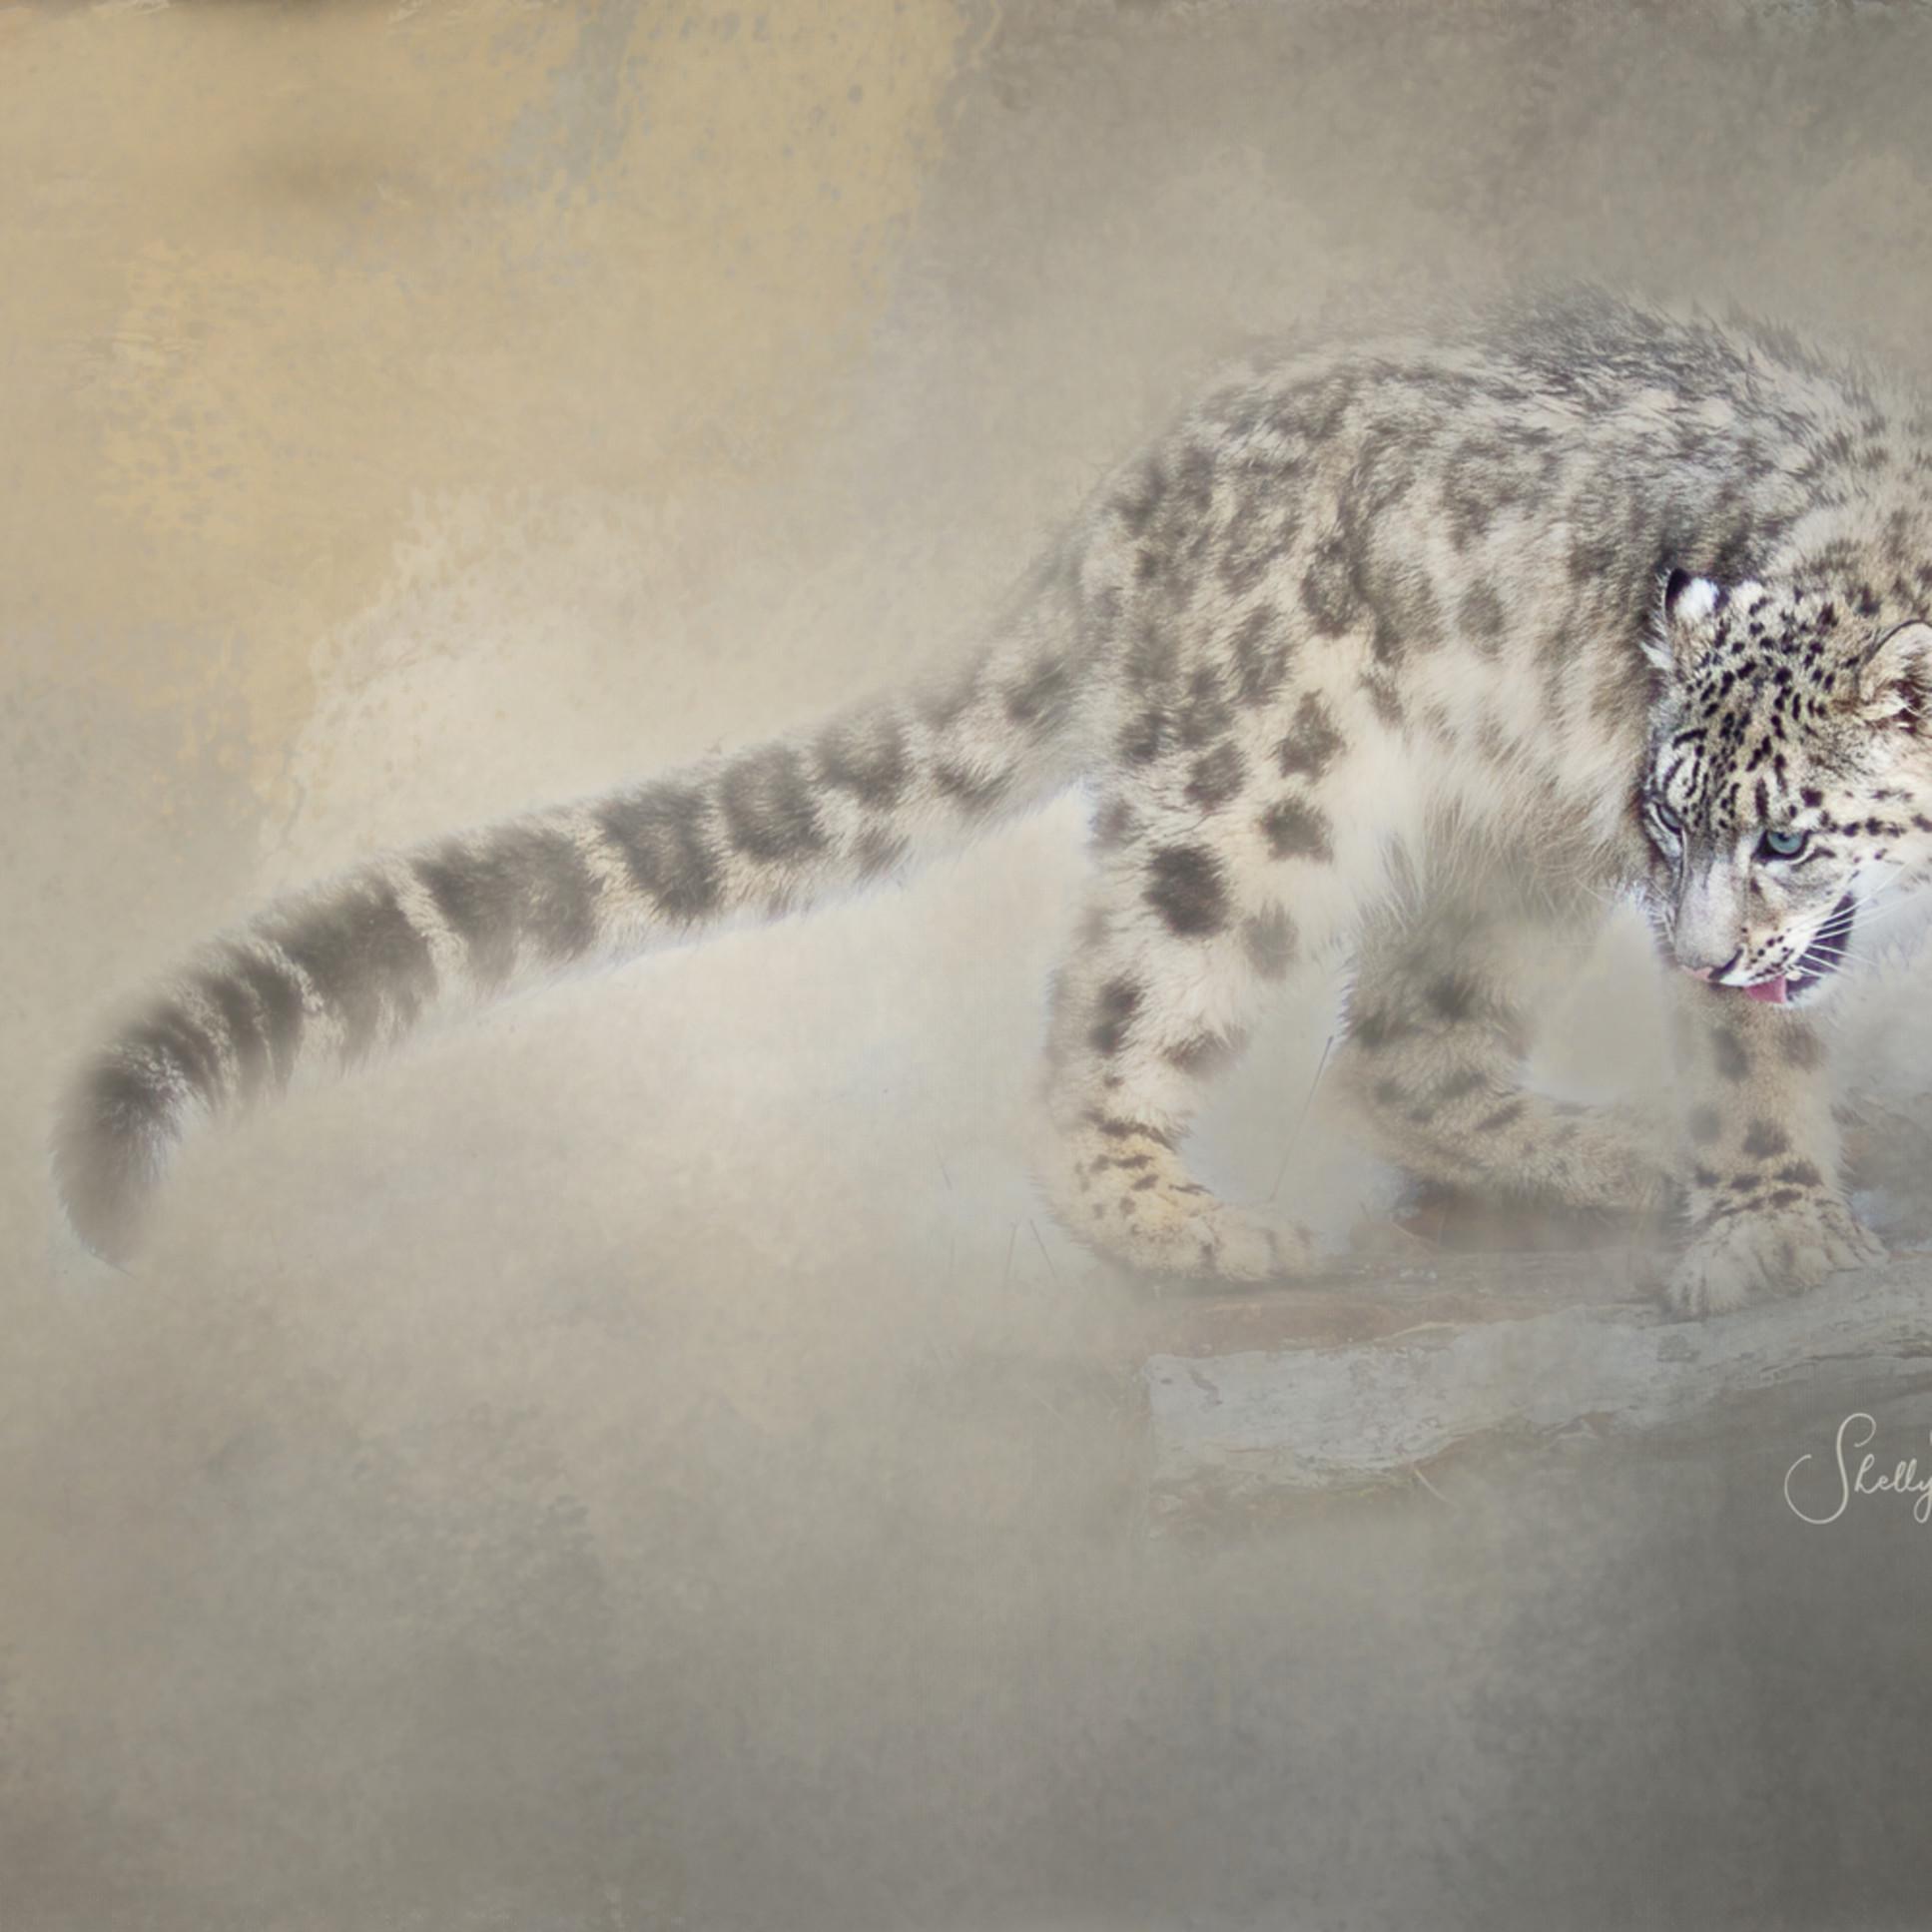 Tripled snowleopard mystique 8733 uz1oyc